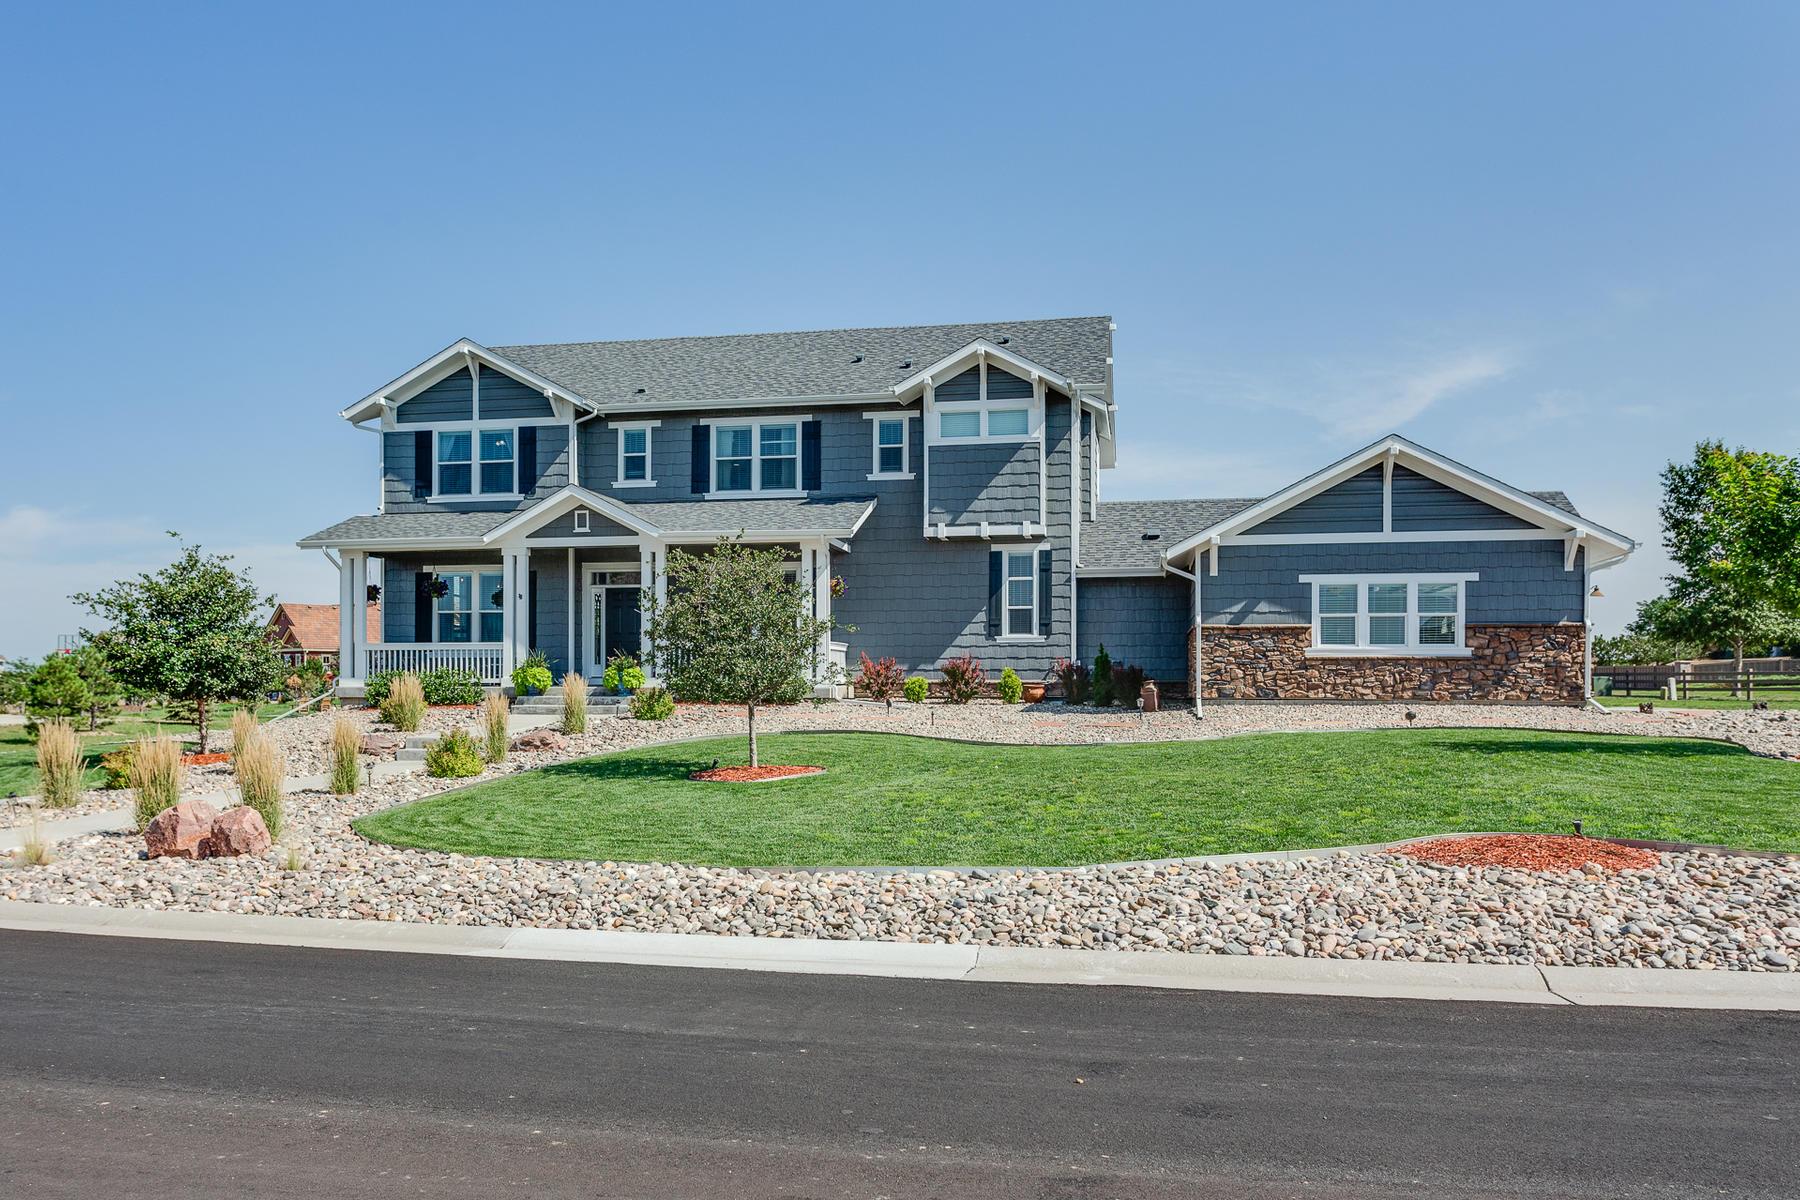 Single Family Home for Active at 7030 Weaver Cir 7030 Weaver Cir Castle Rock, Colorado 80104 United States